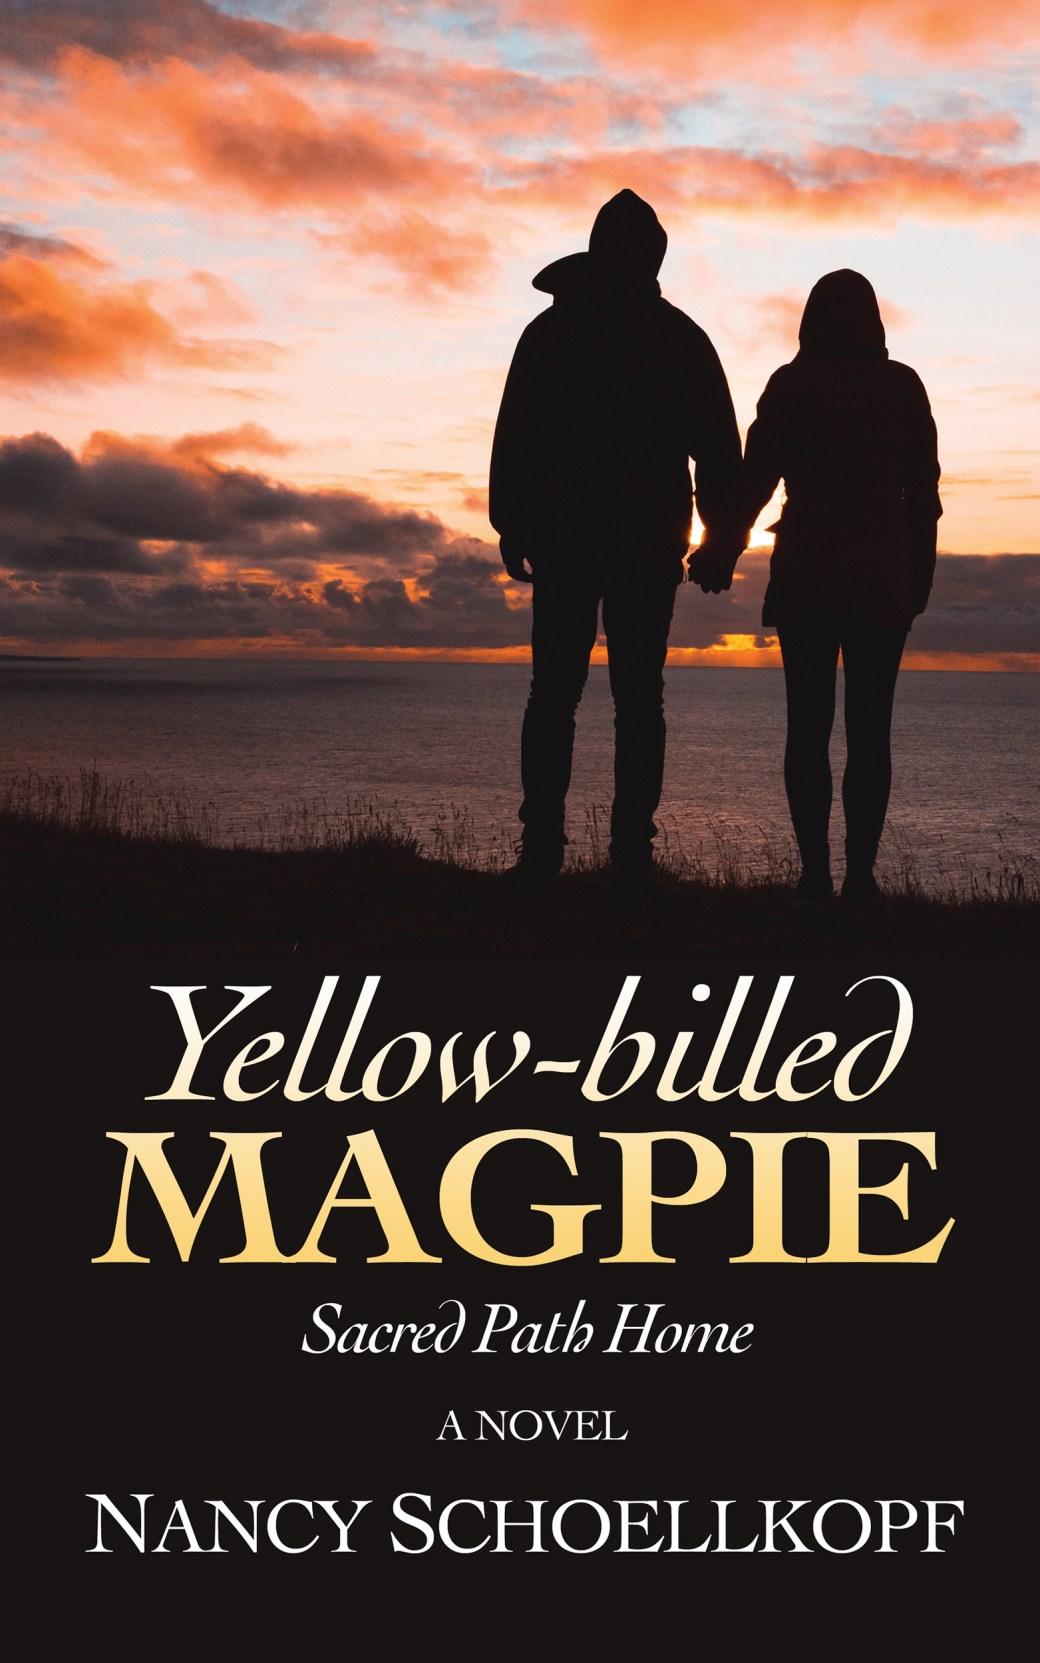 MAGPIE_New_eBook_1563x2500_final